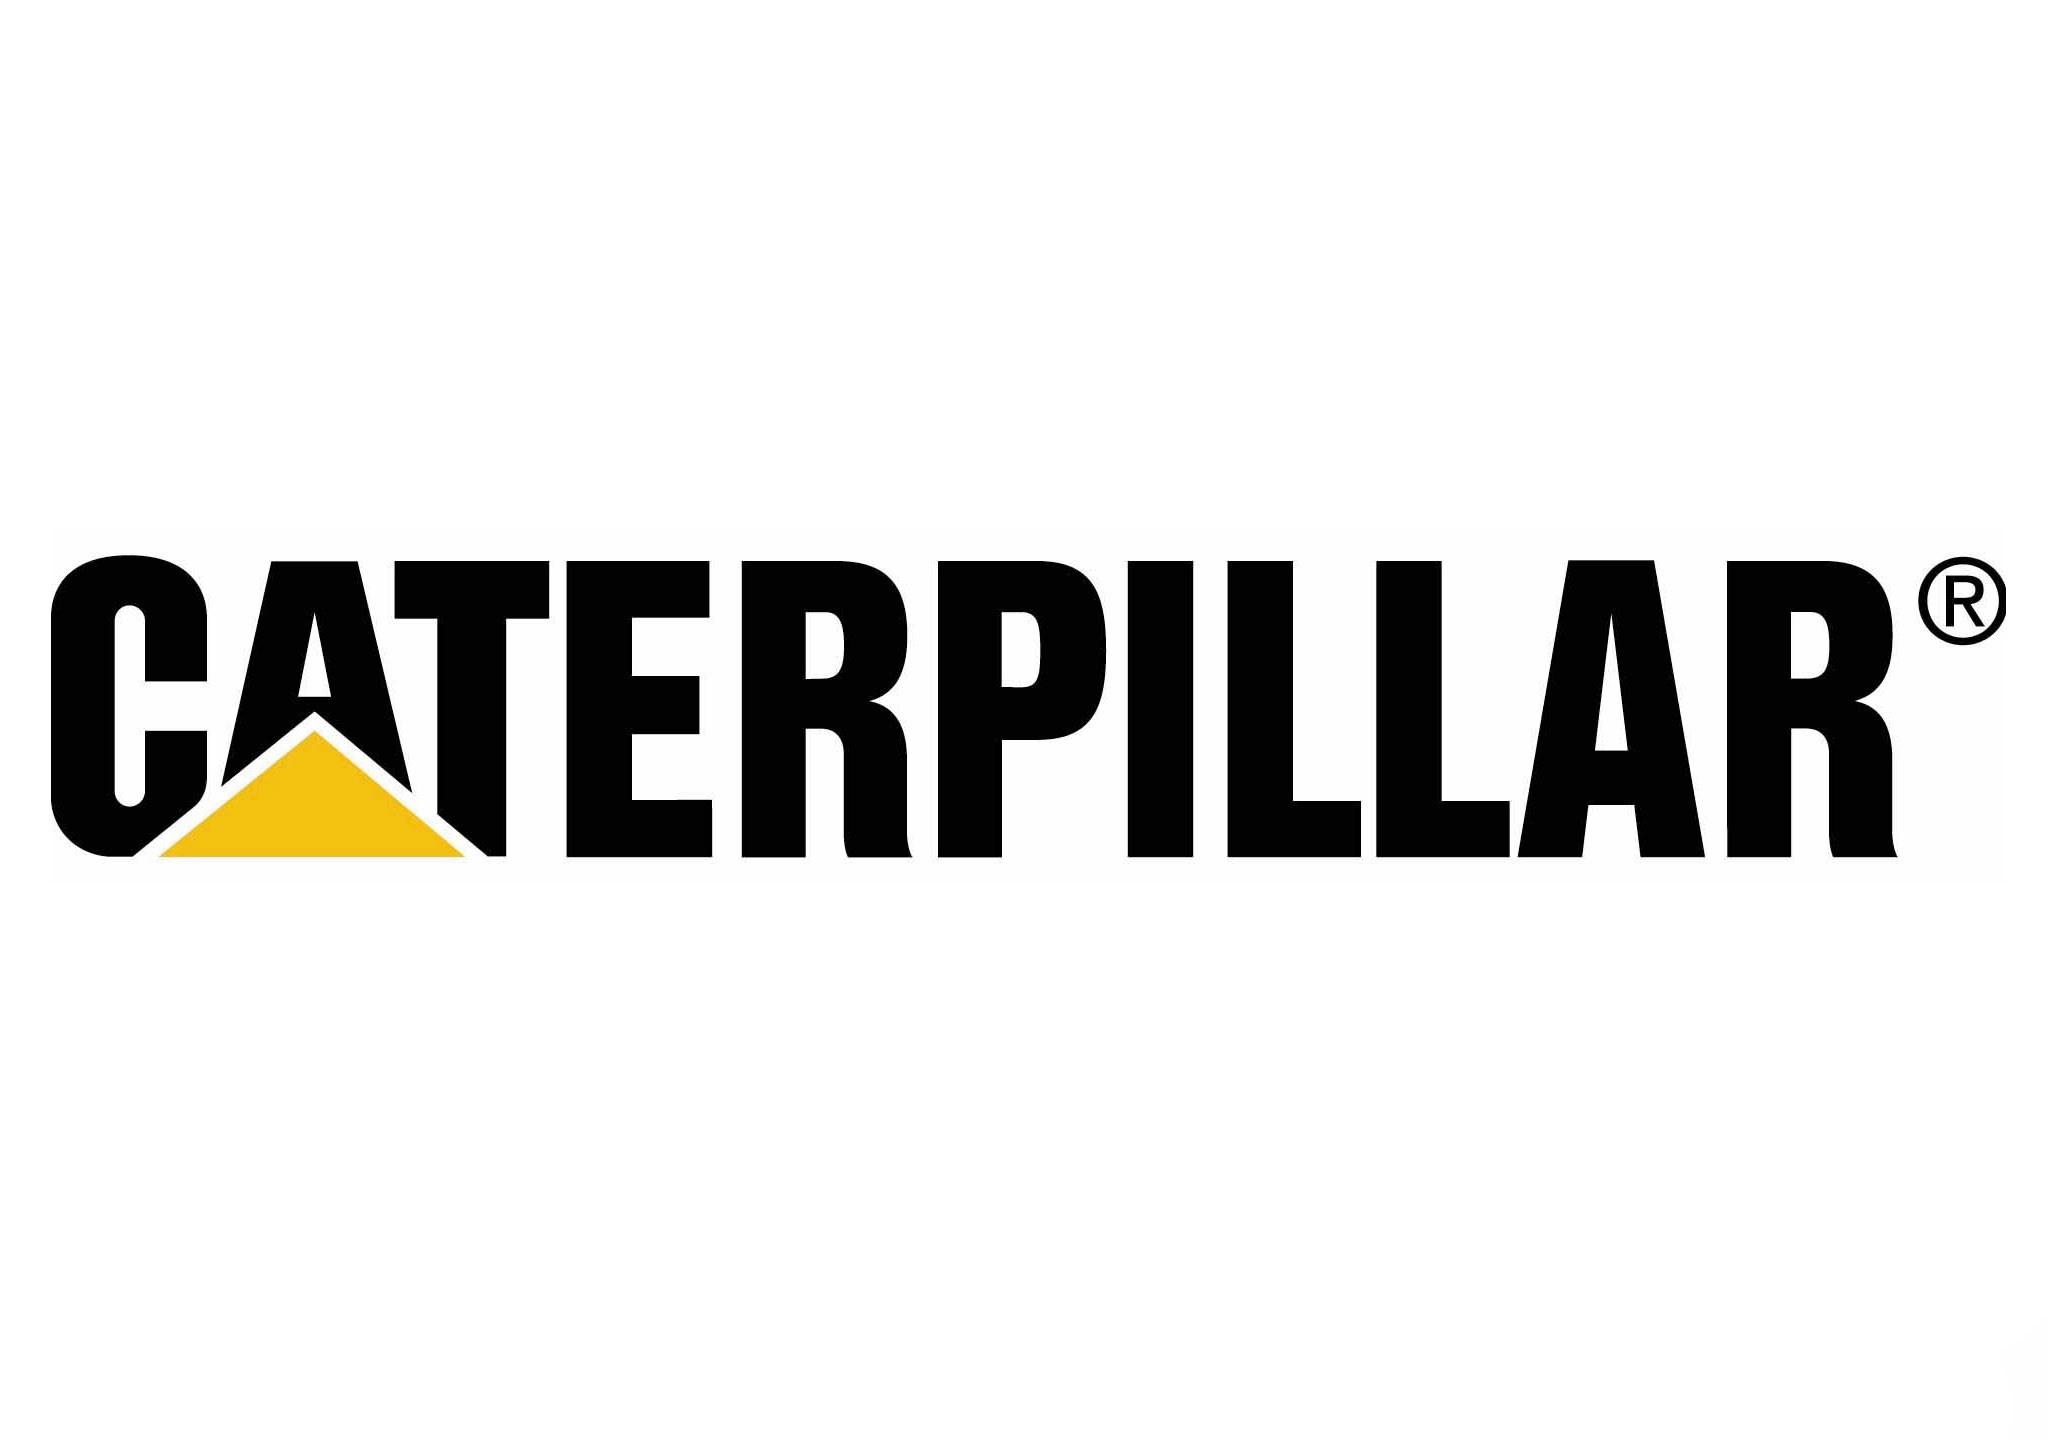 Caterpillar-logo_1493124658315.jpg